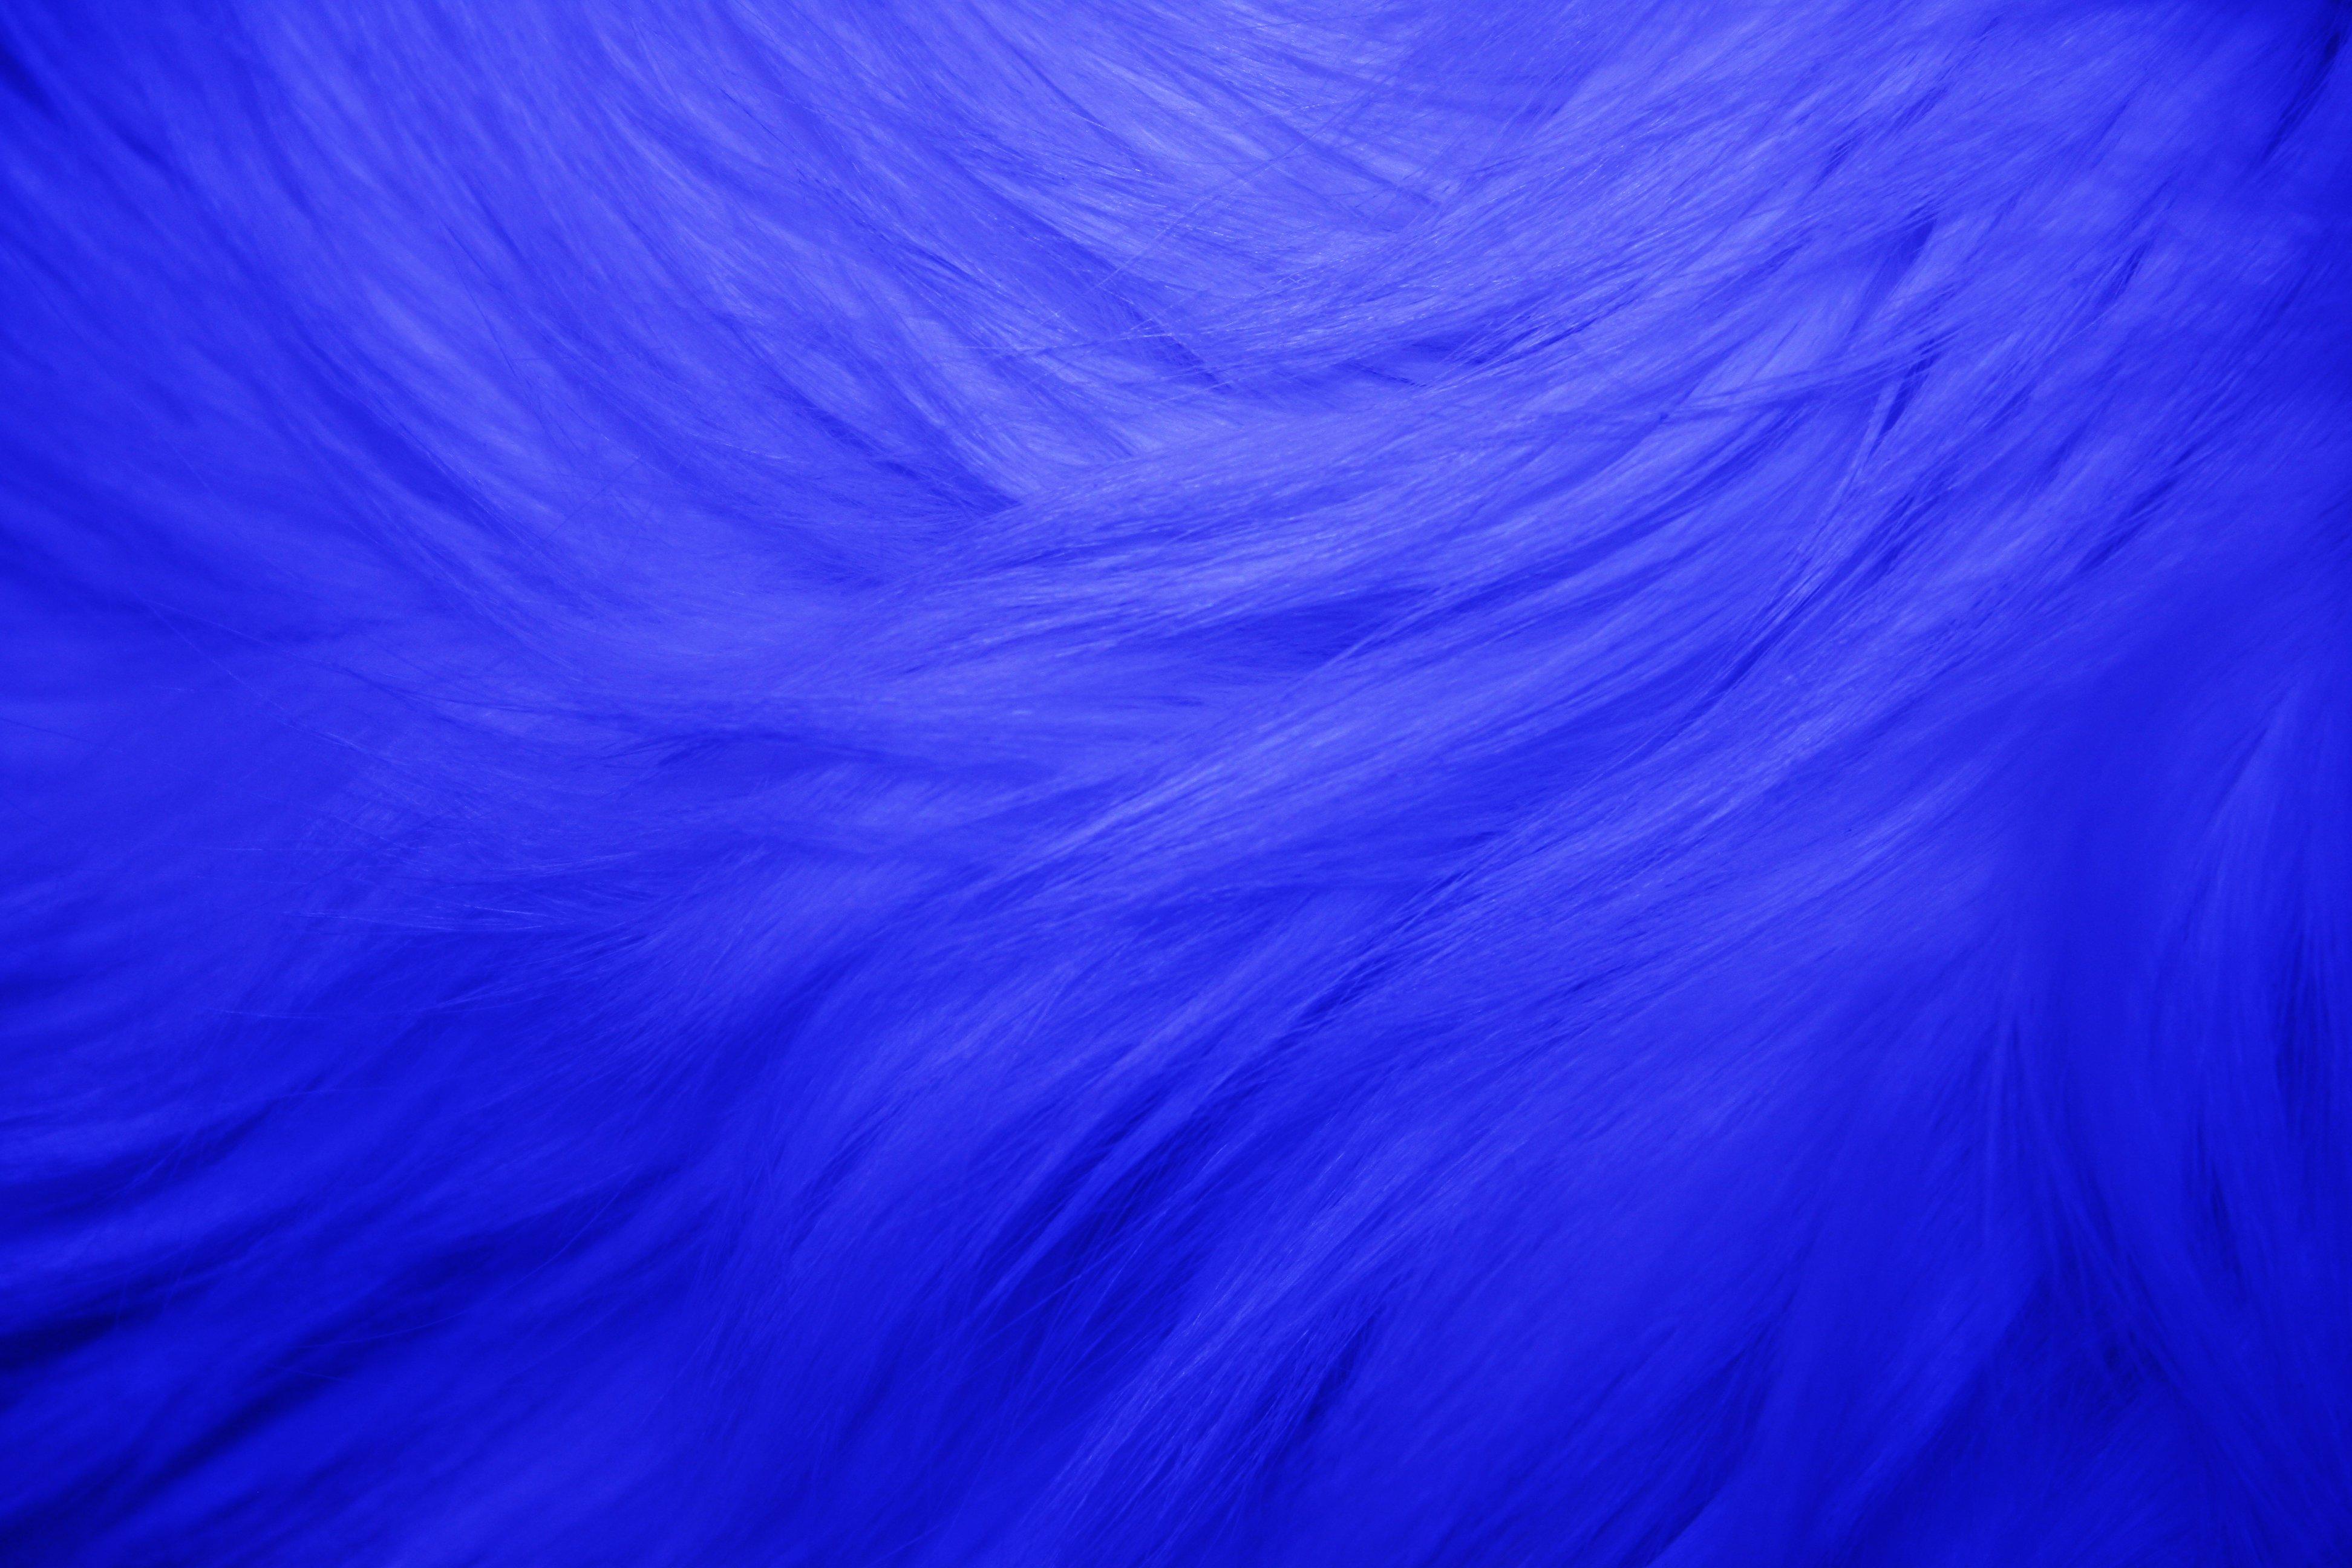 Must see Wallpaper High Resolution Blue - blue-fur-texture  Pic_946853.jpg